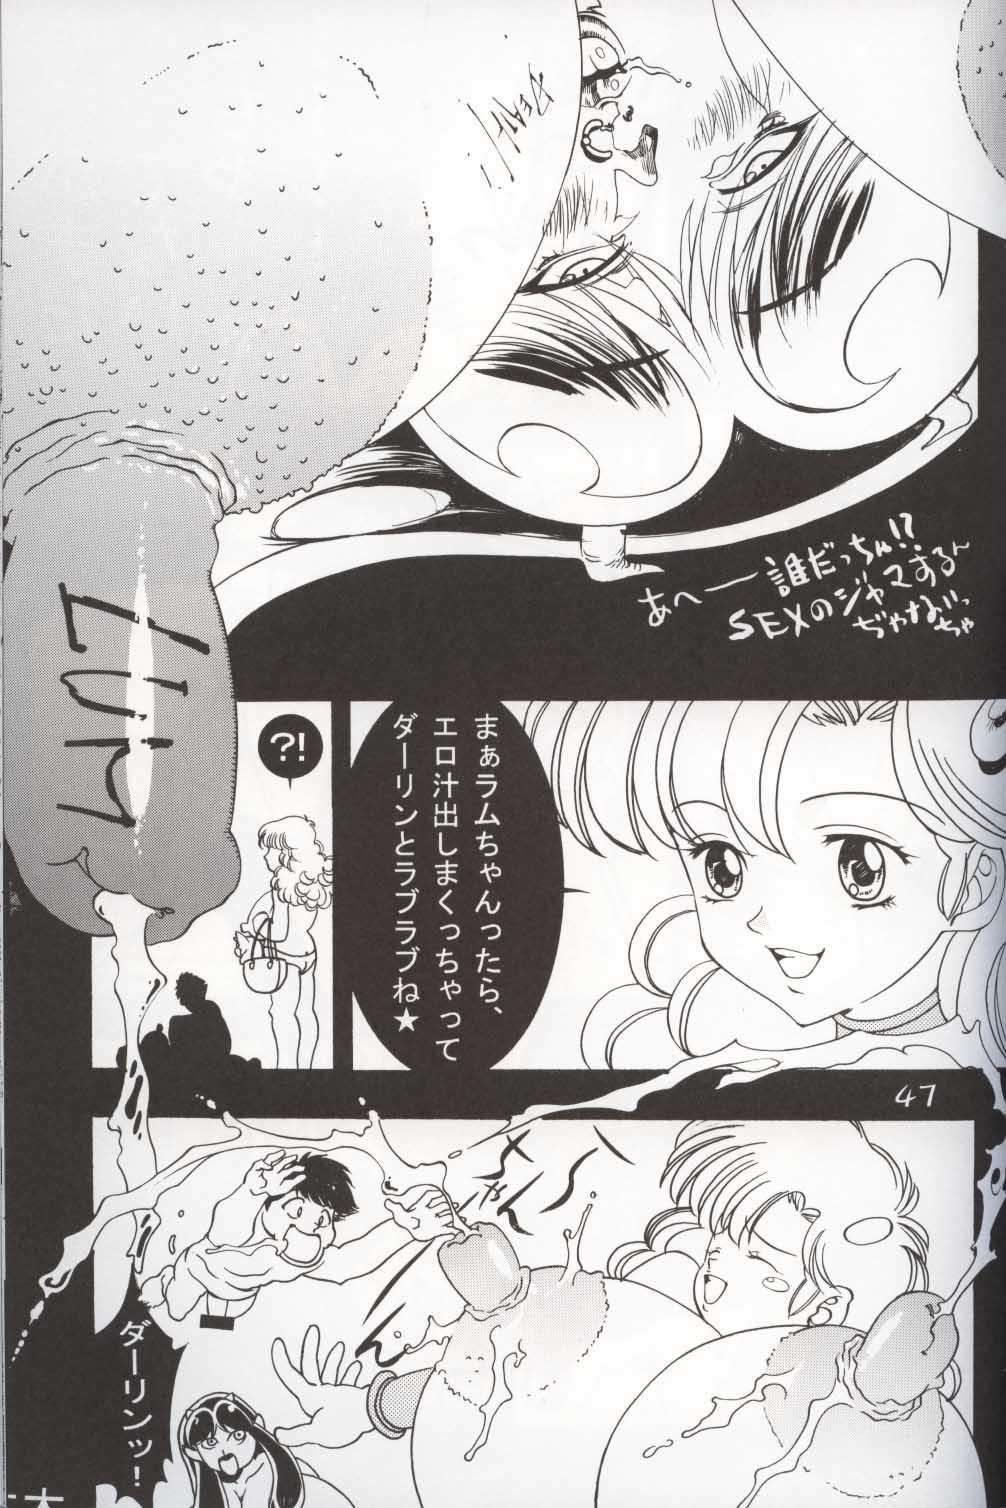 GIRL POWER Vol.10 44